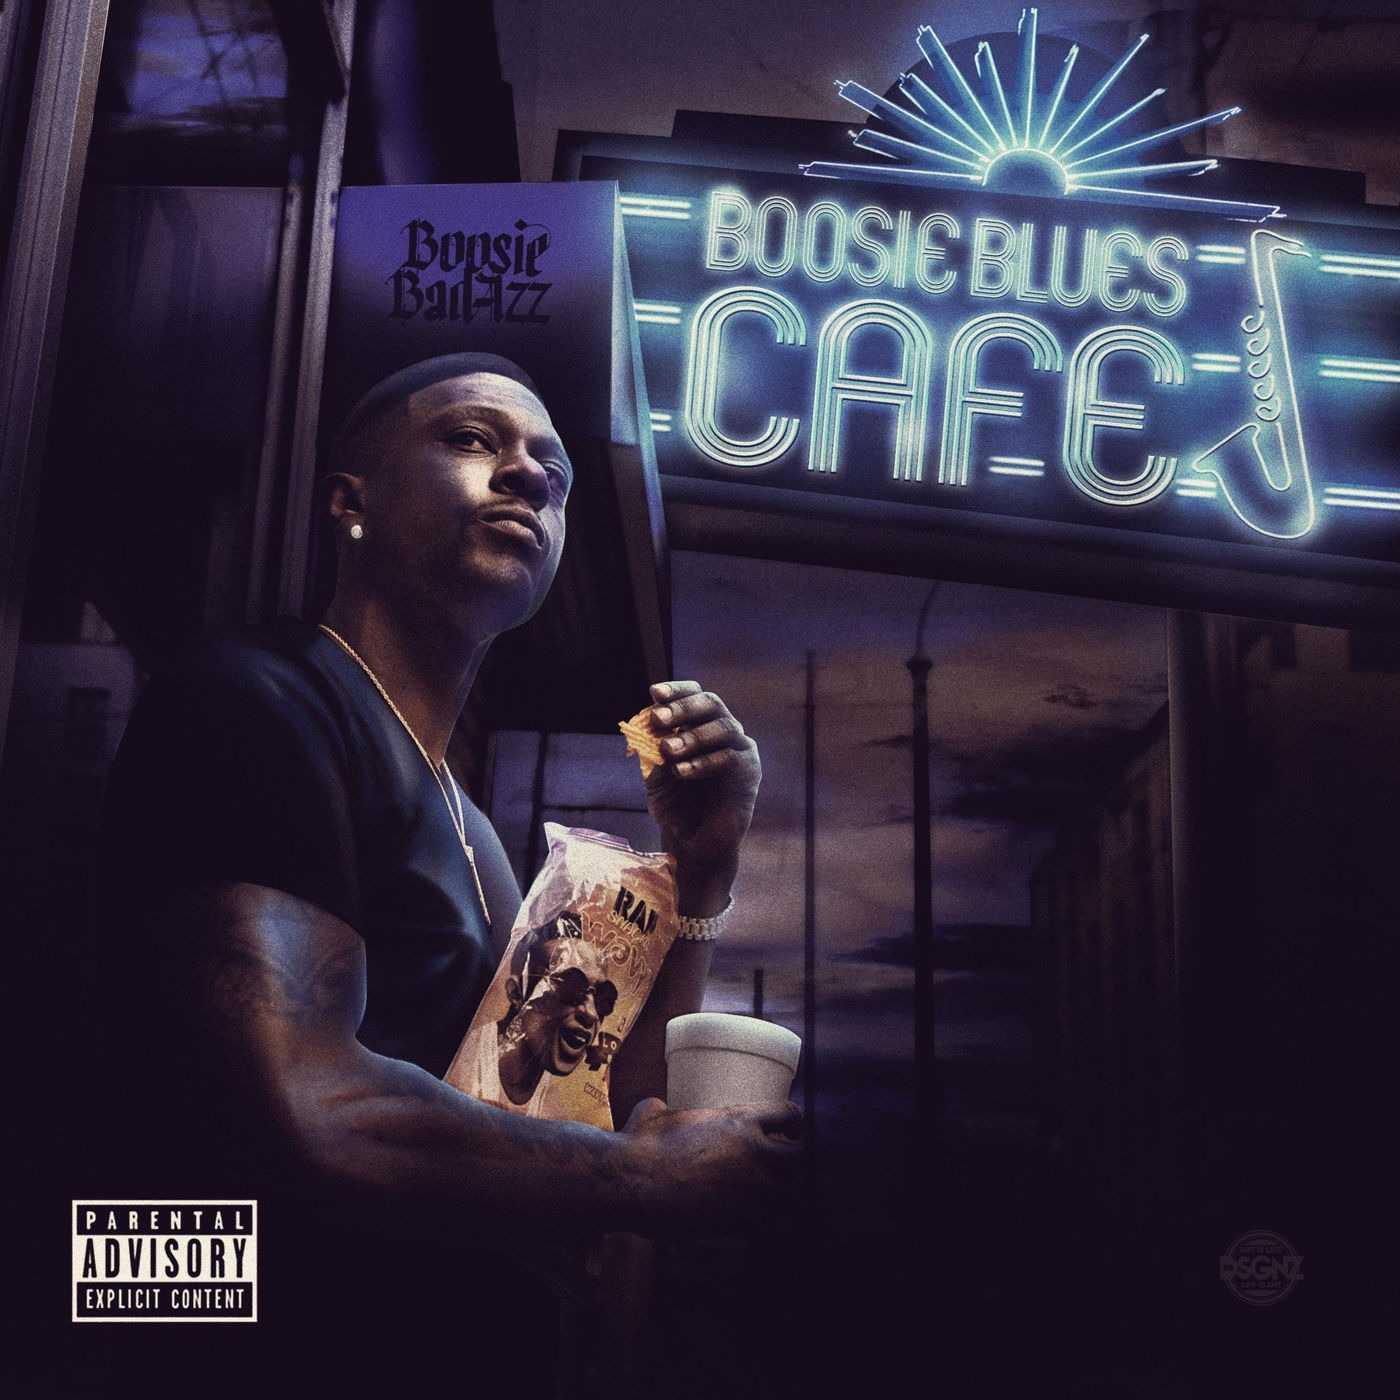 New Project: Boosie Badazz | Boosie Blues Cafe [Audio]